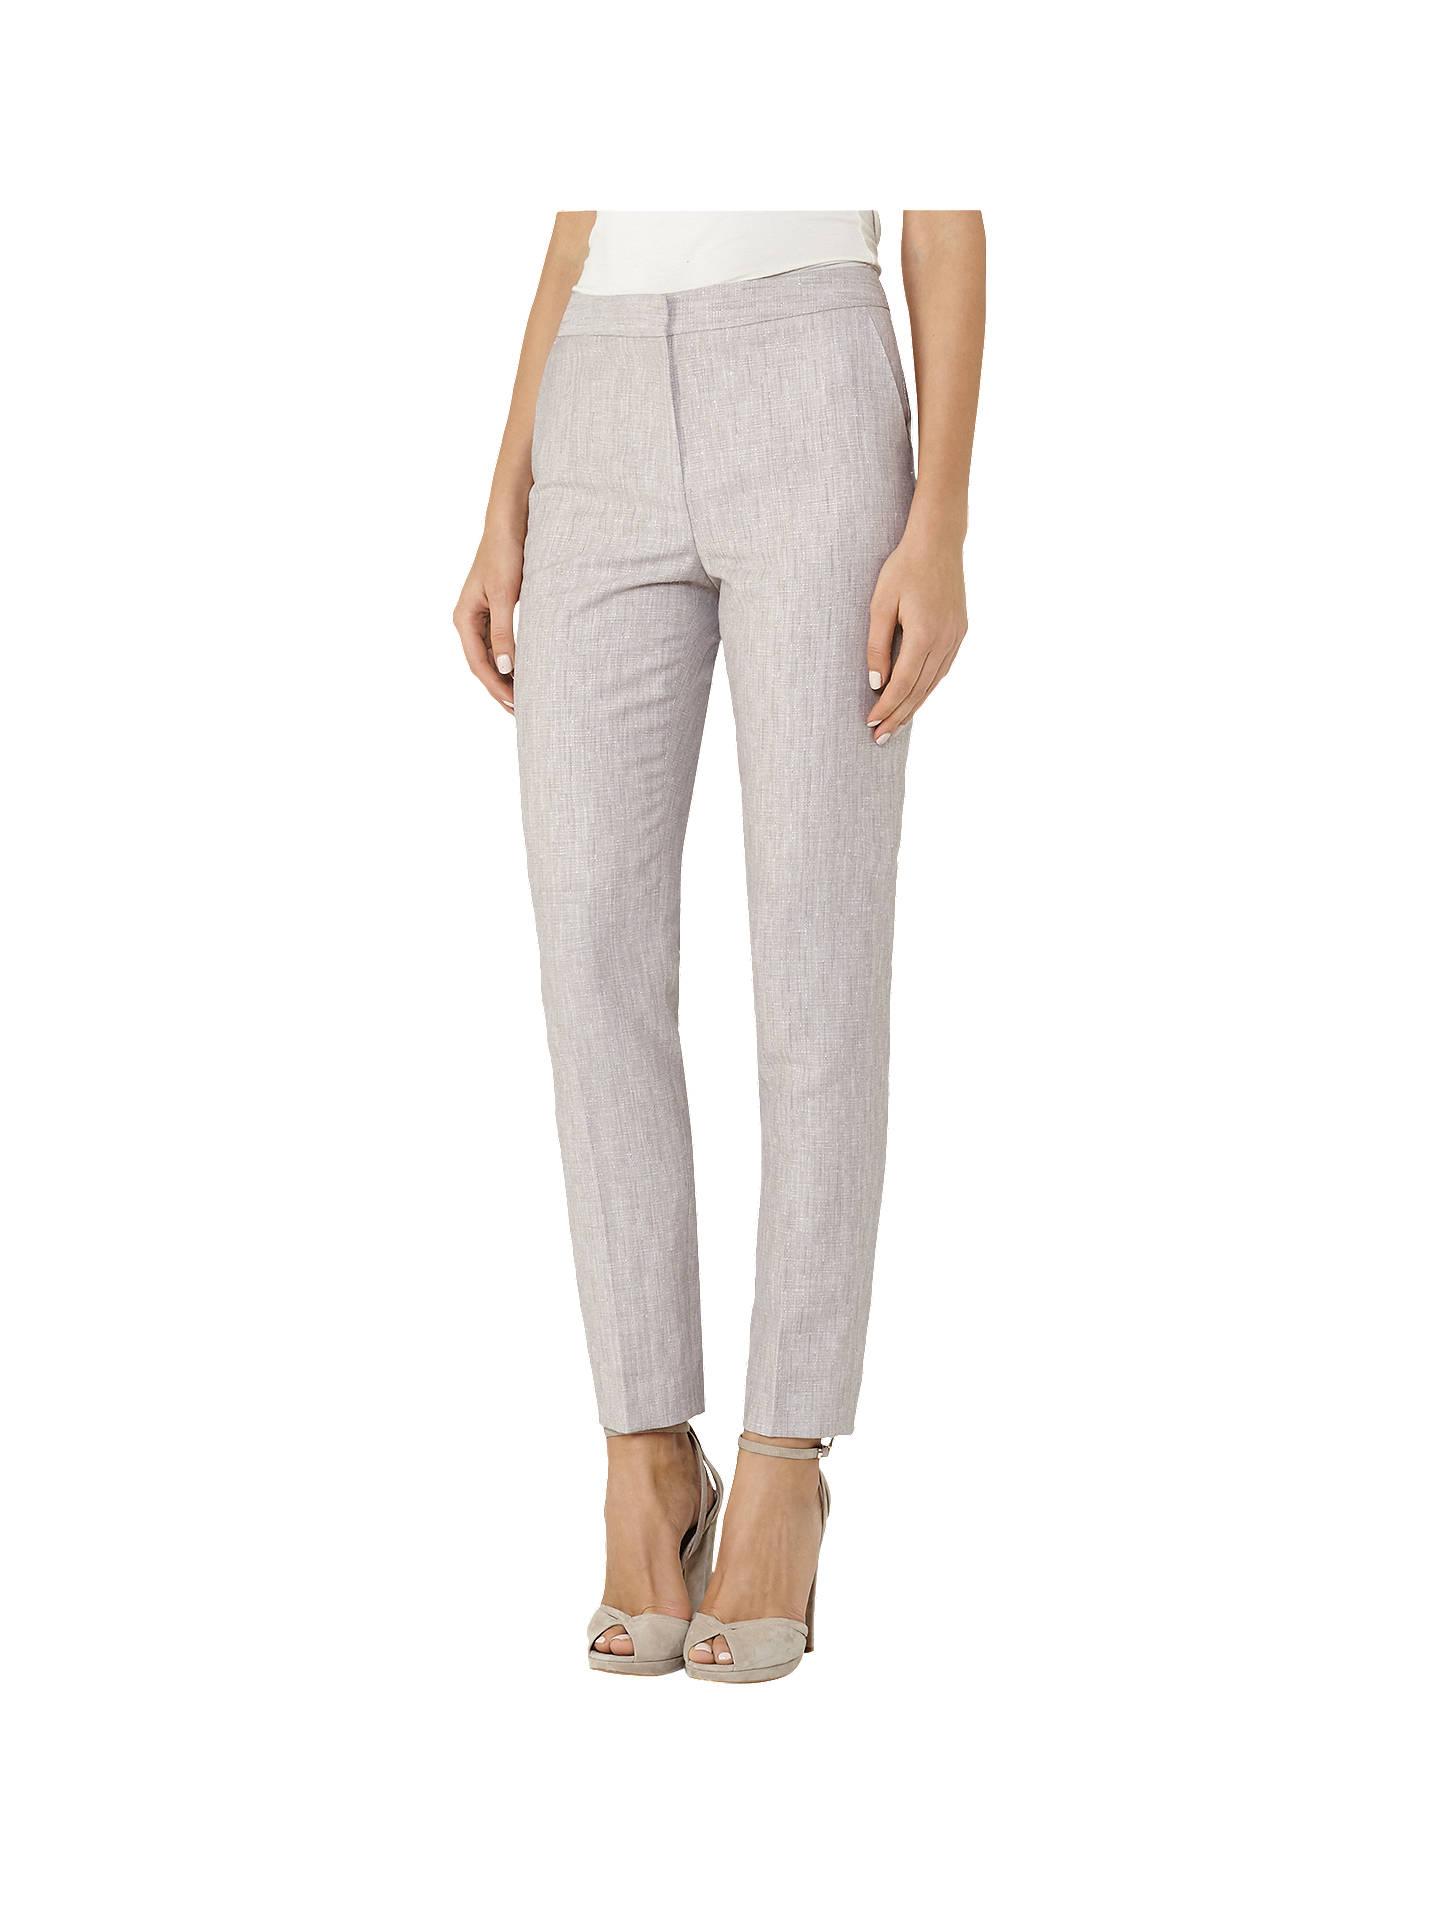 ac794bece88 Reiss Virginia Trousers, Pink Grey at John Lewis & Partners